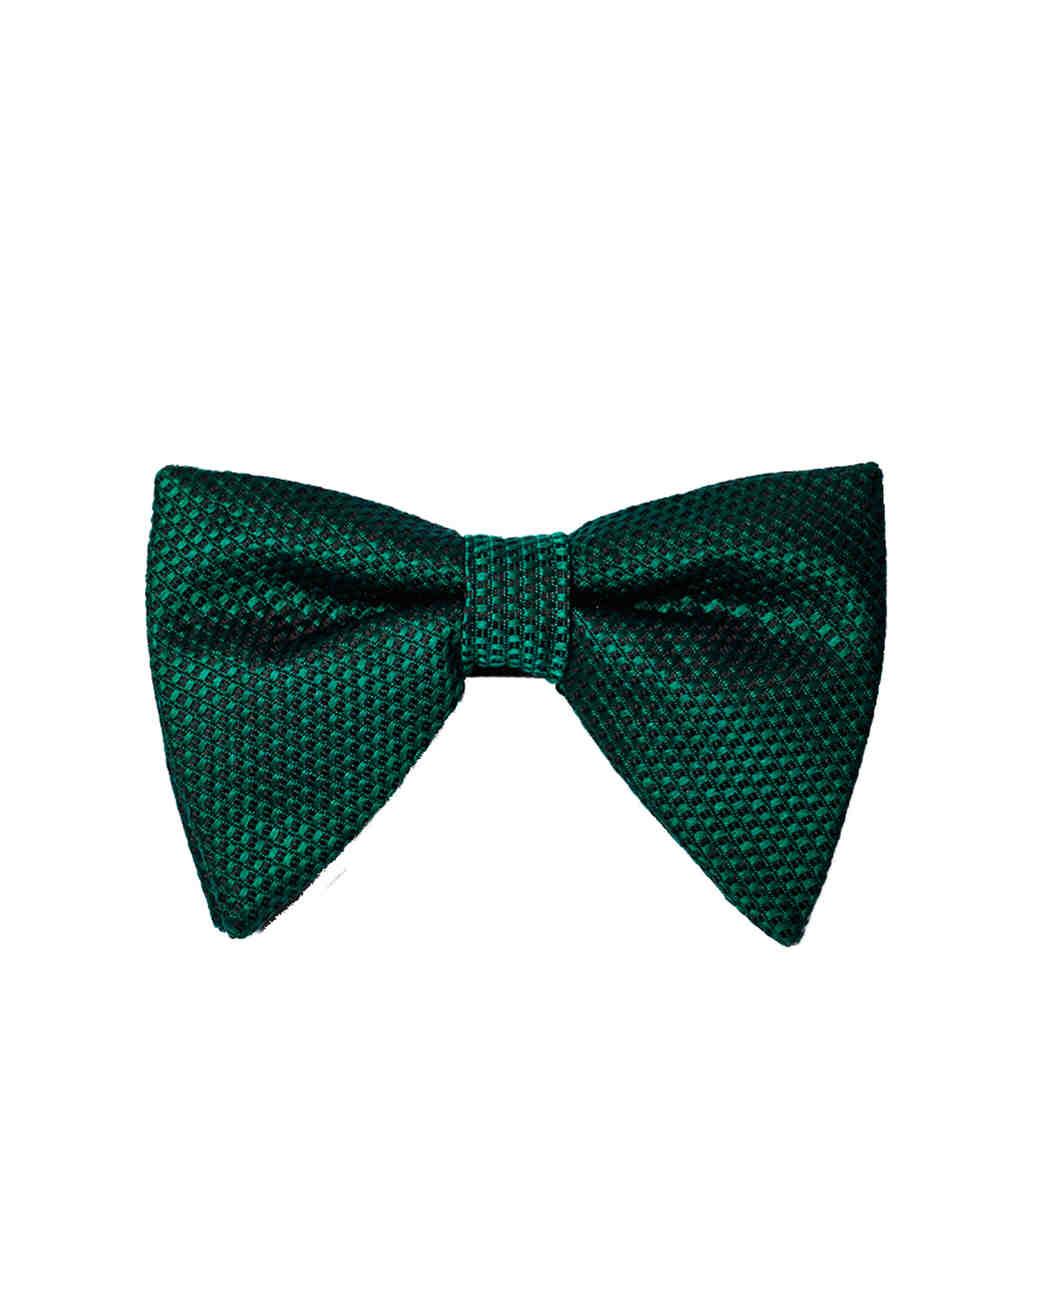 bow-ties-thetiebar-aristocrat-hunter-green-0814.jpg